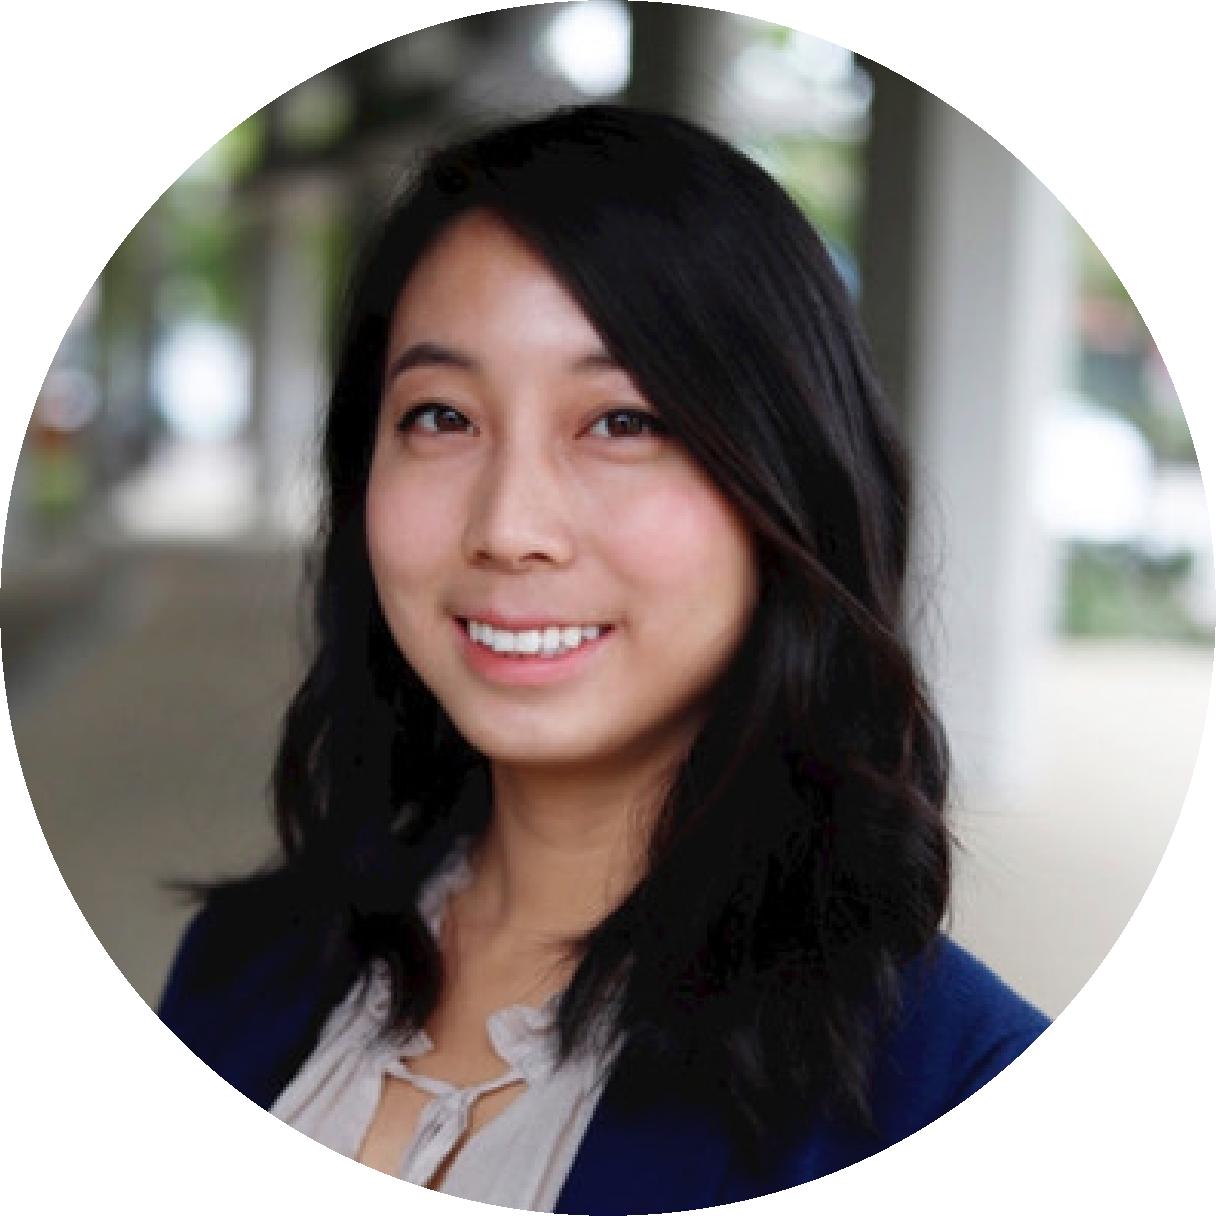 Renee Lin, Speaker at Women Impact Tech